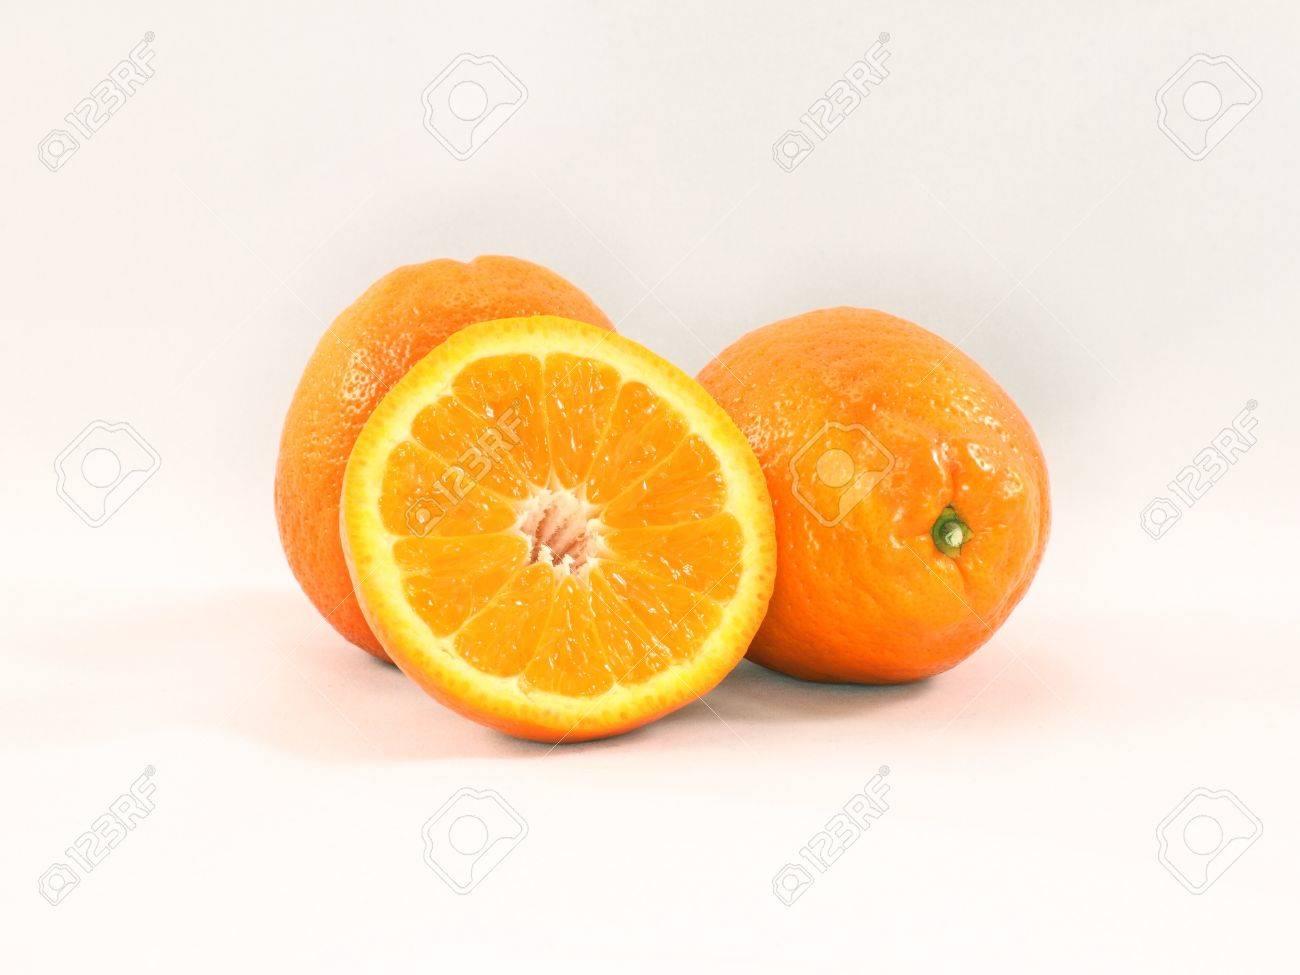 tangelo oranges